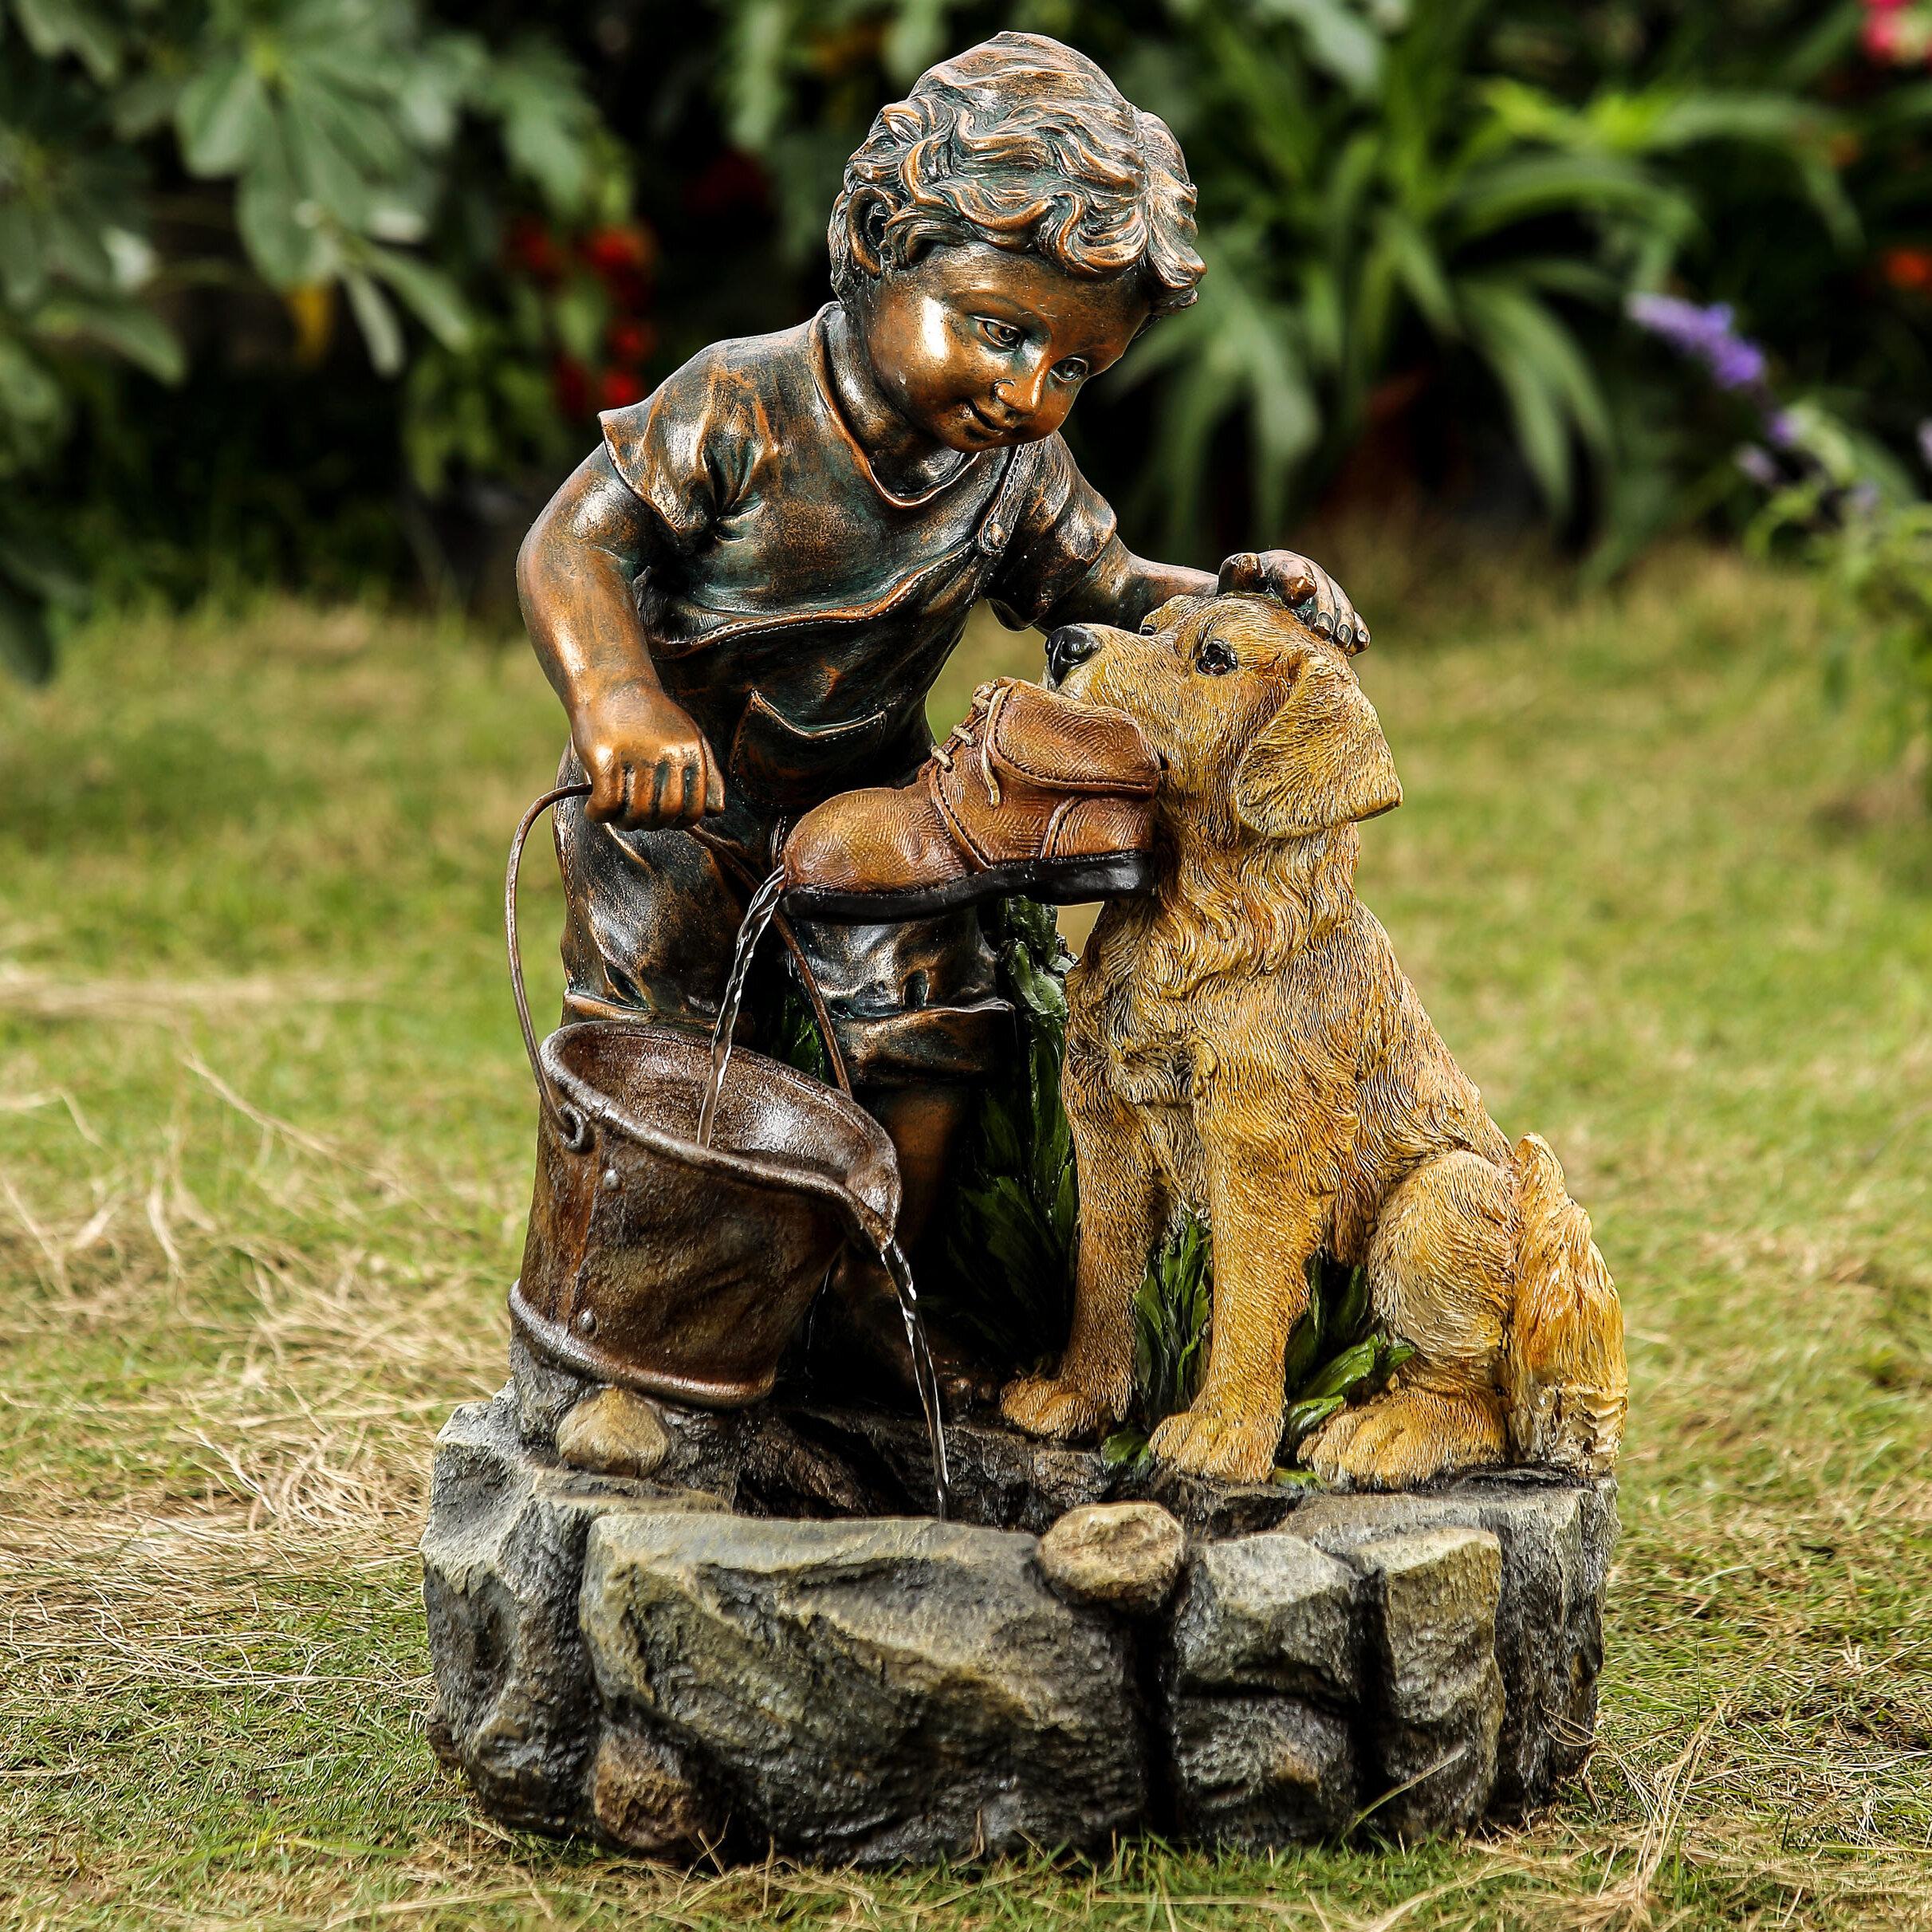 Jeco Inc. Resin/Fiberglass Boy Plays with Dog Water Fountain   Wayfair